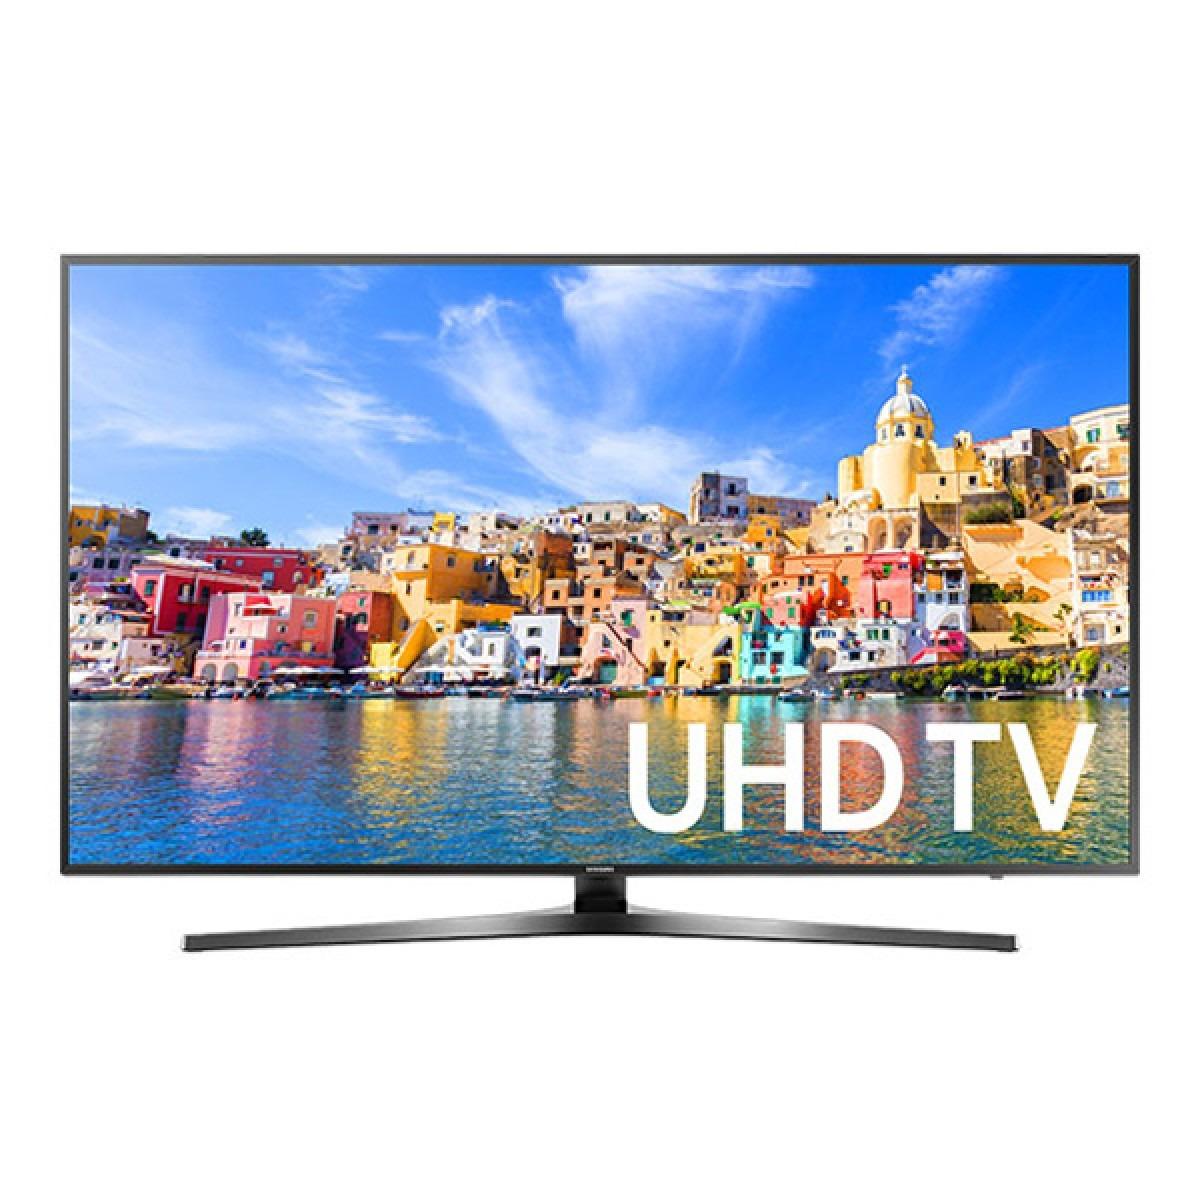 Buy Samsung 40 40ku7000 4k Smart Led Tv Online In India At Lowest